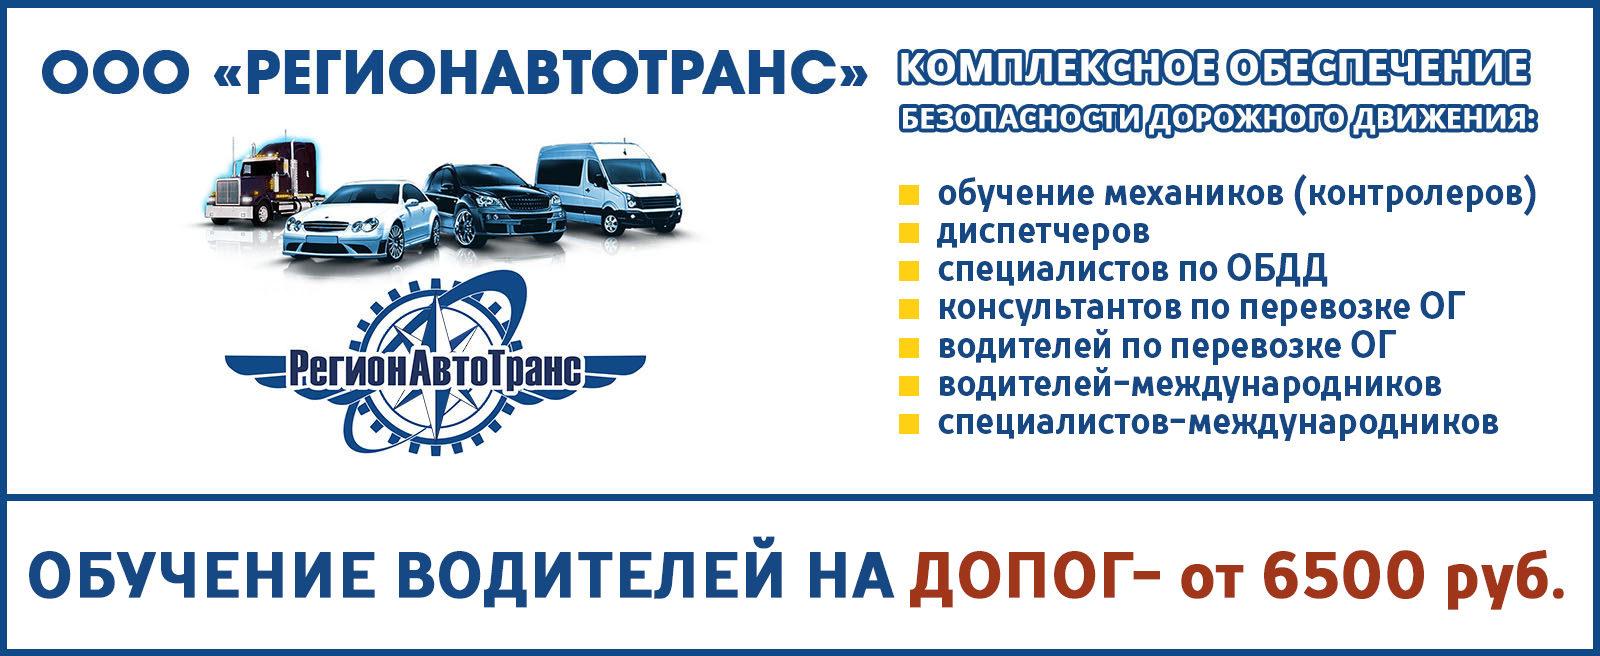 ООО Регионавтотранс